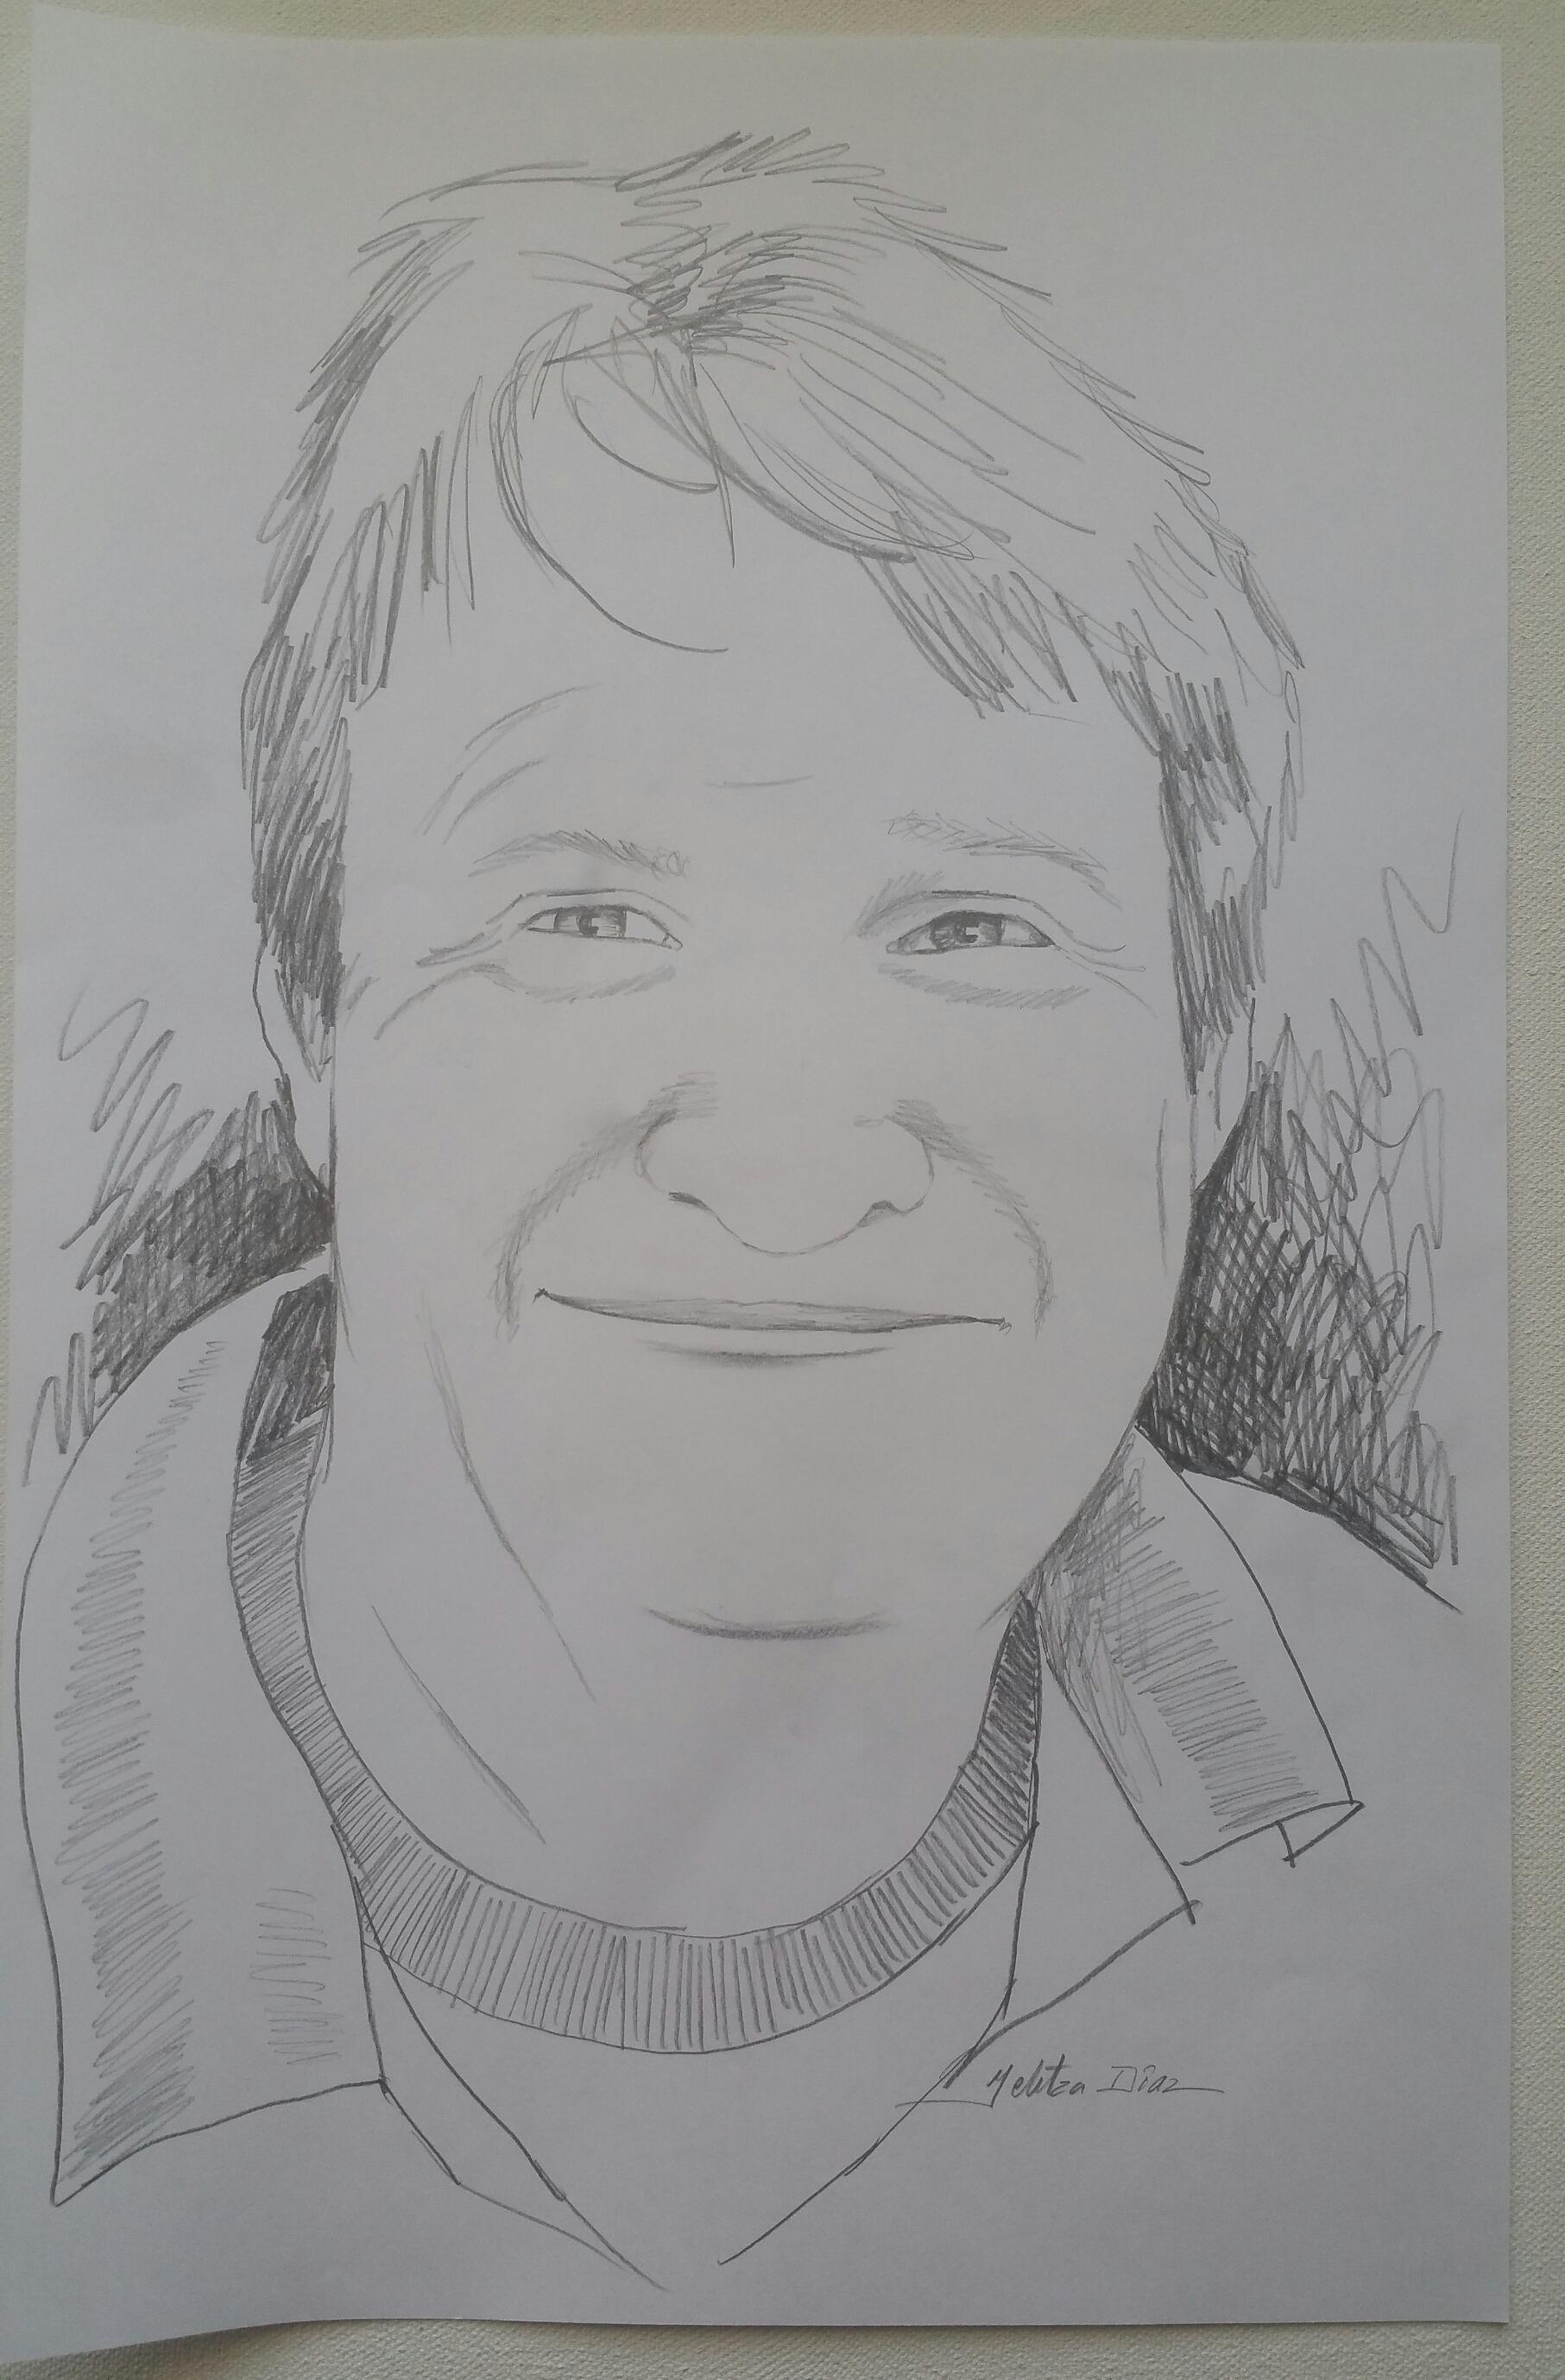 Joe McMahon